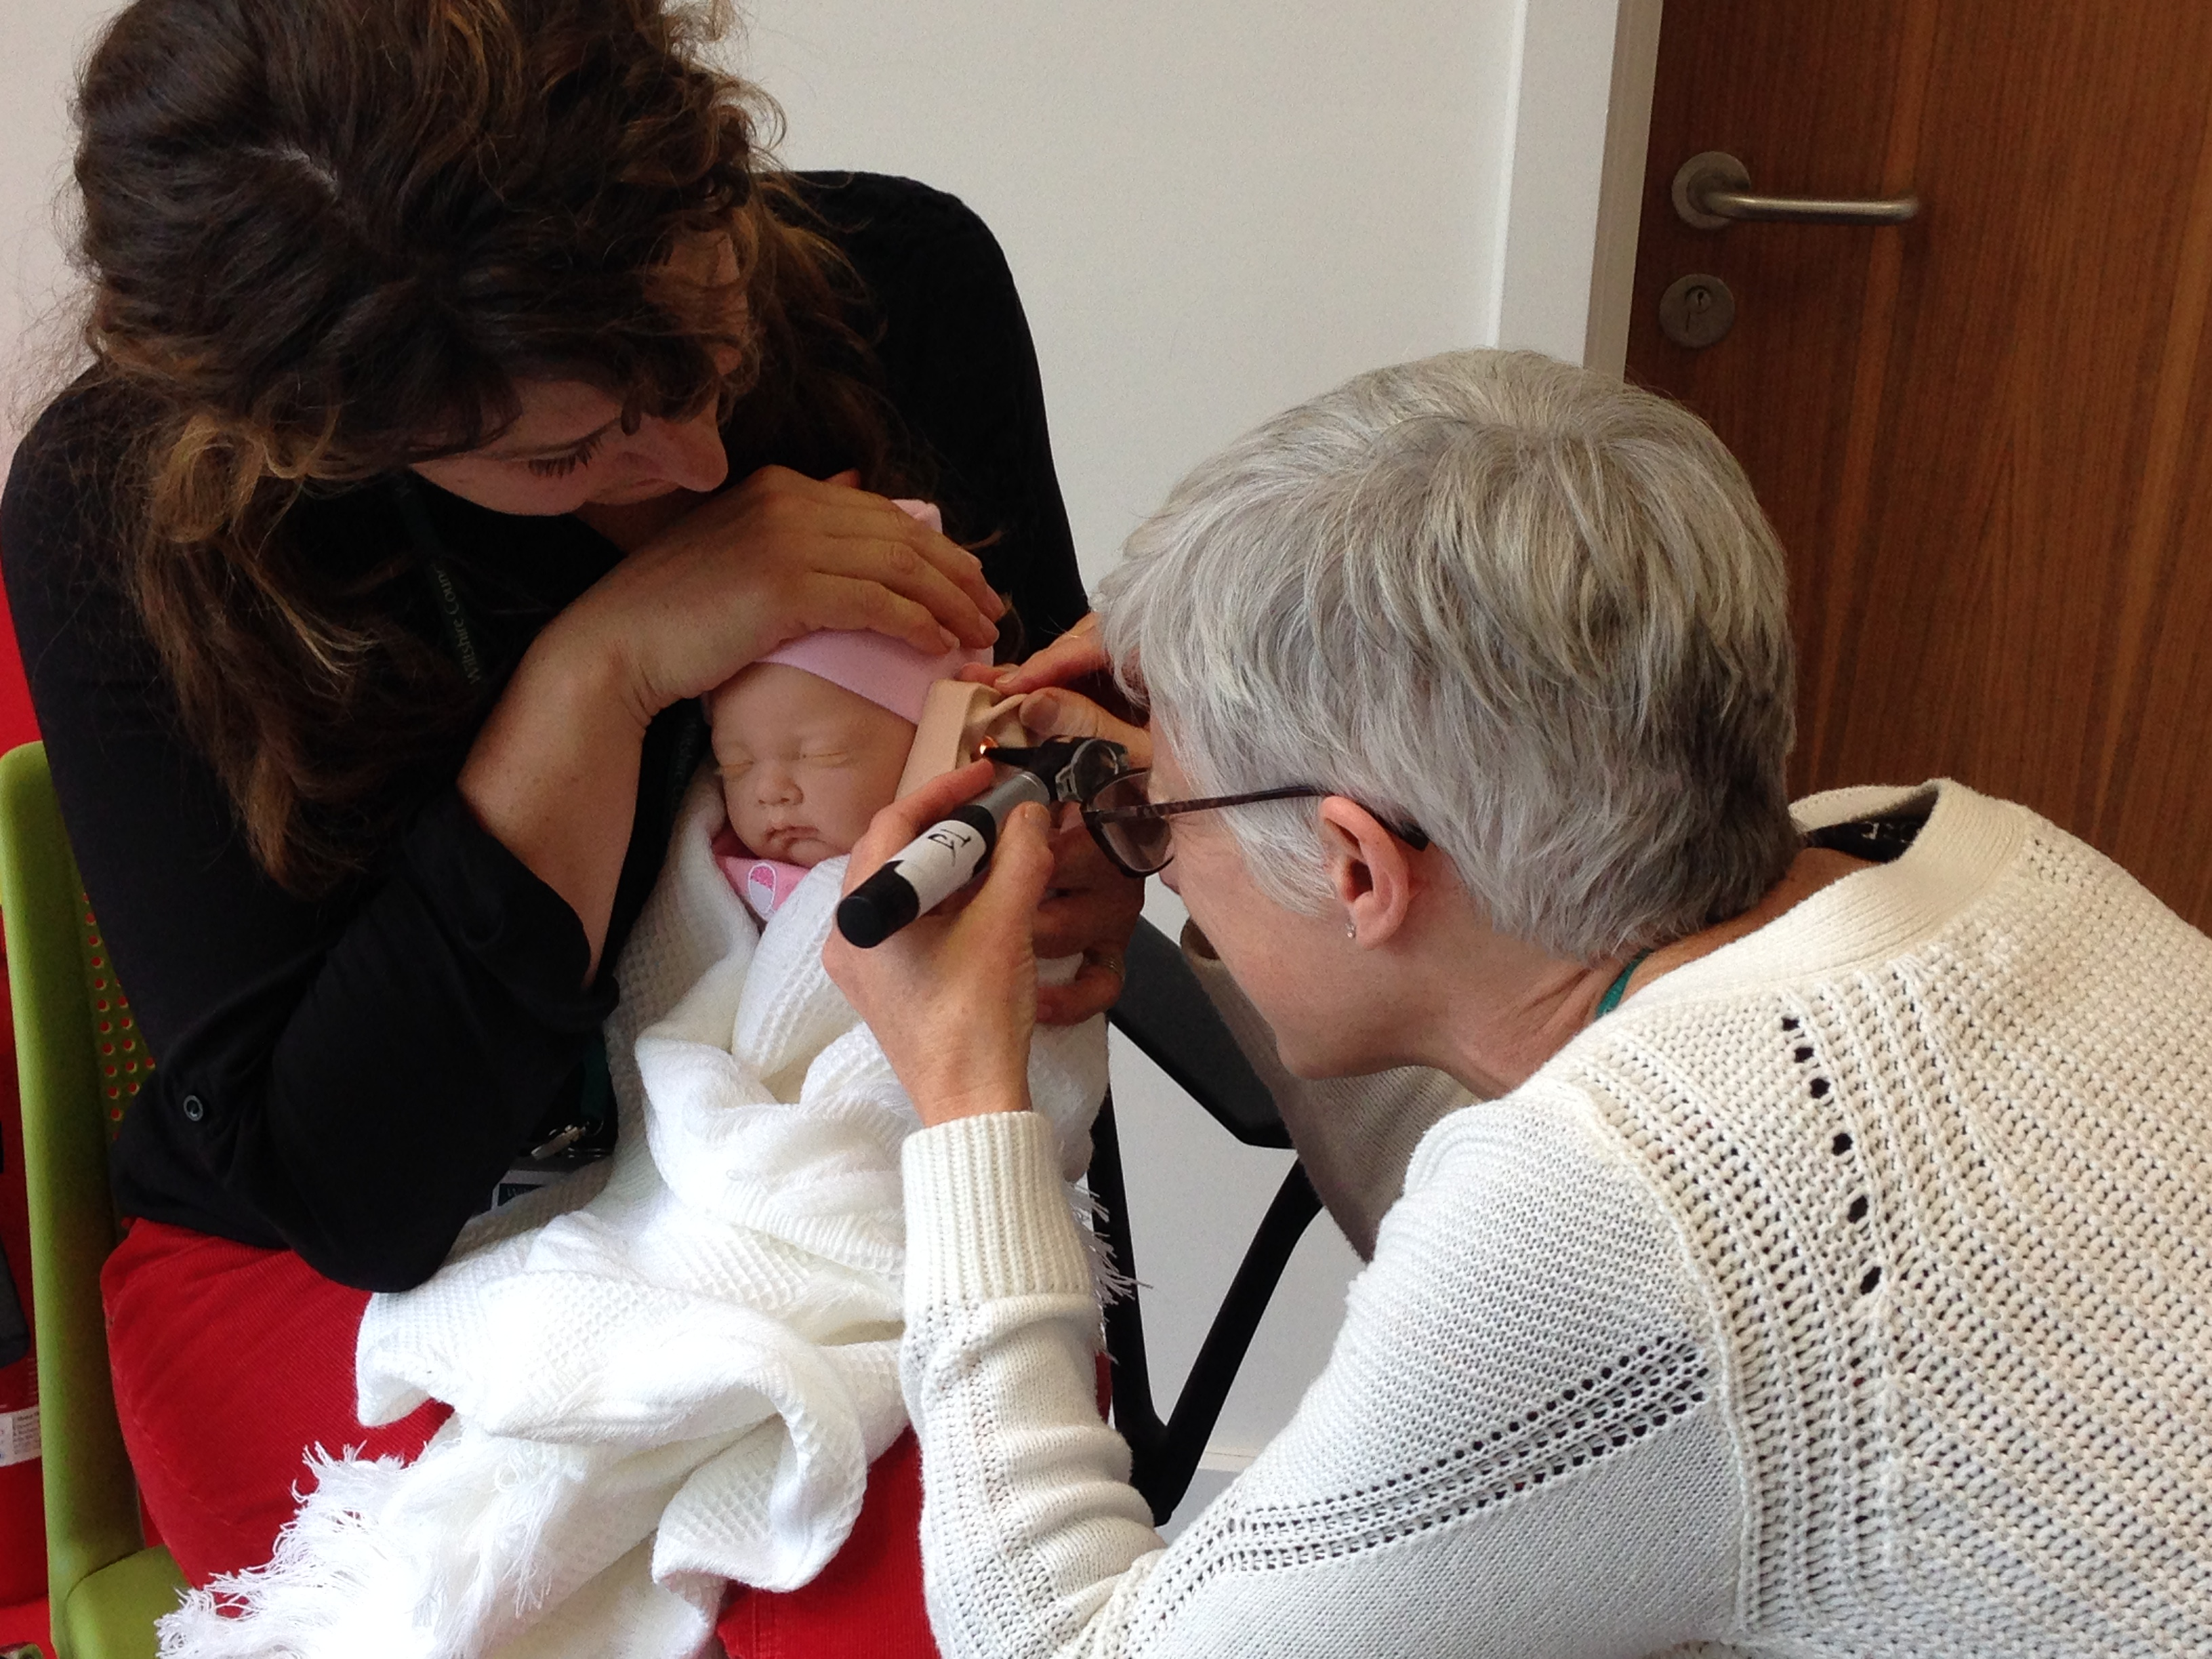 Otoscopy on a newborn baby